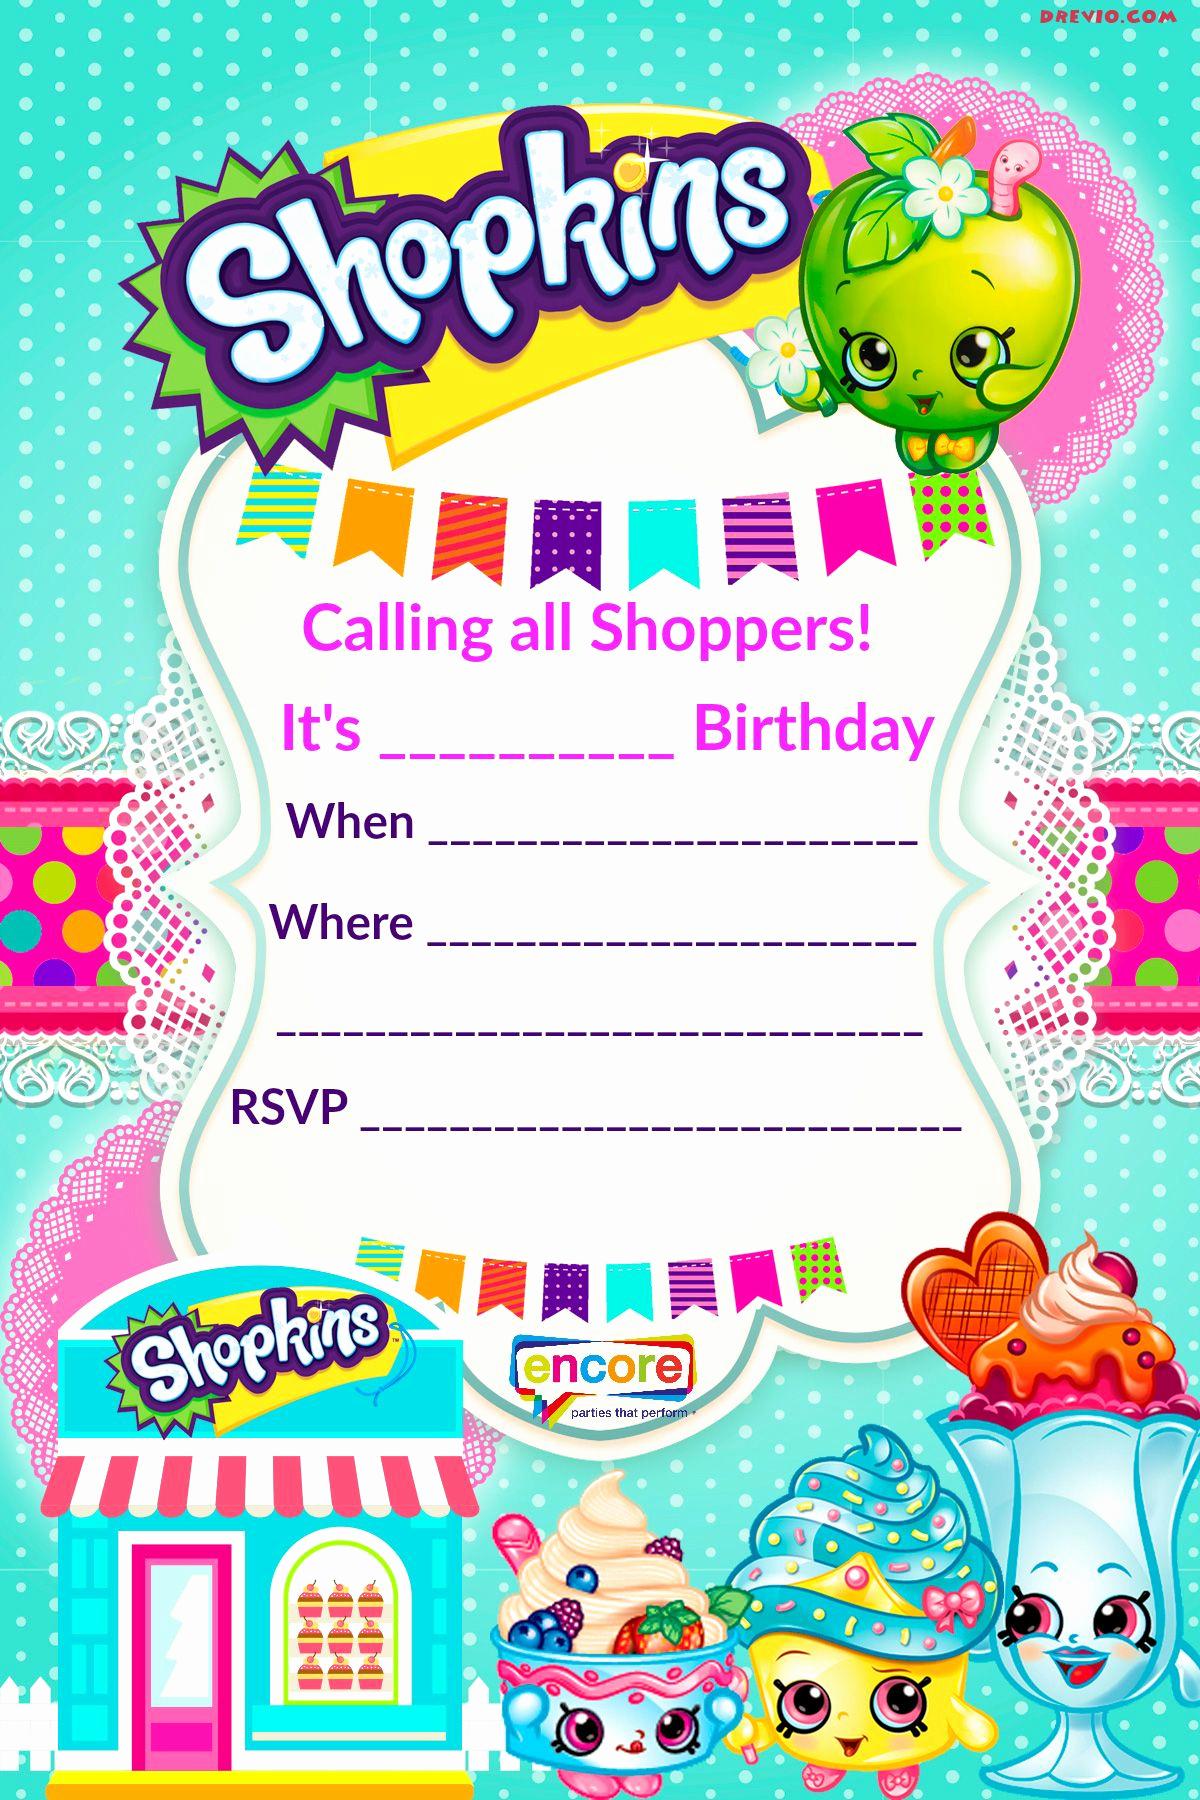 Shopkins Birthday Invitation Template Lovely Updated Free Printable Shopkins Birthday Invitation